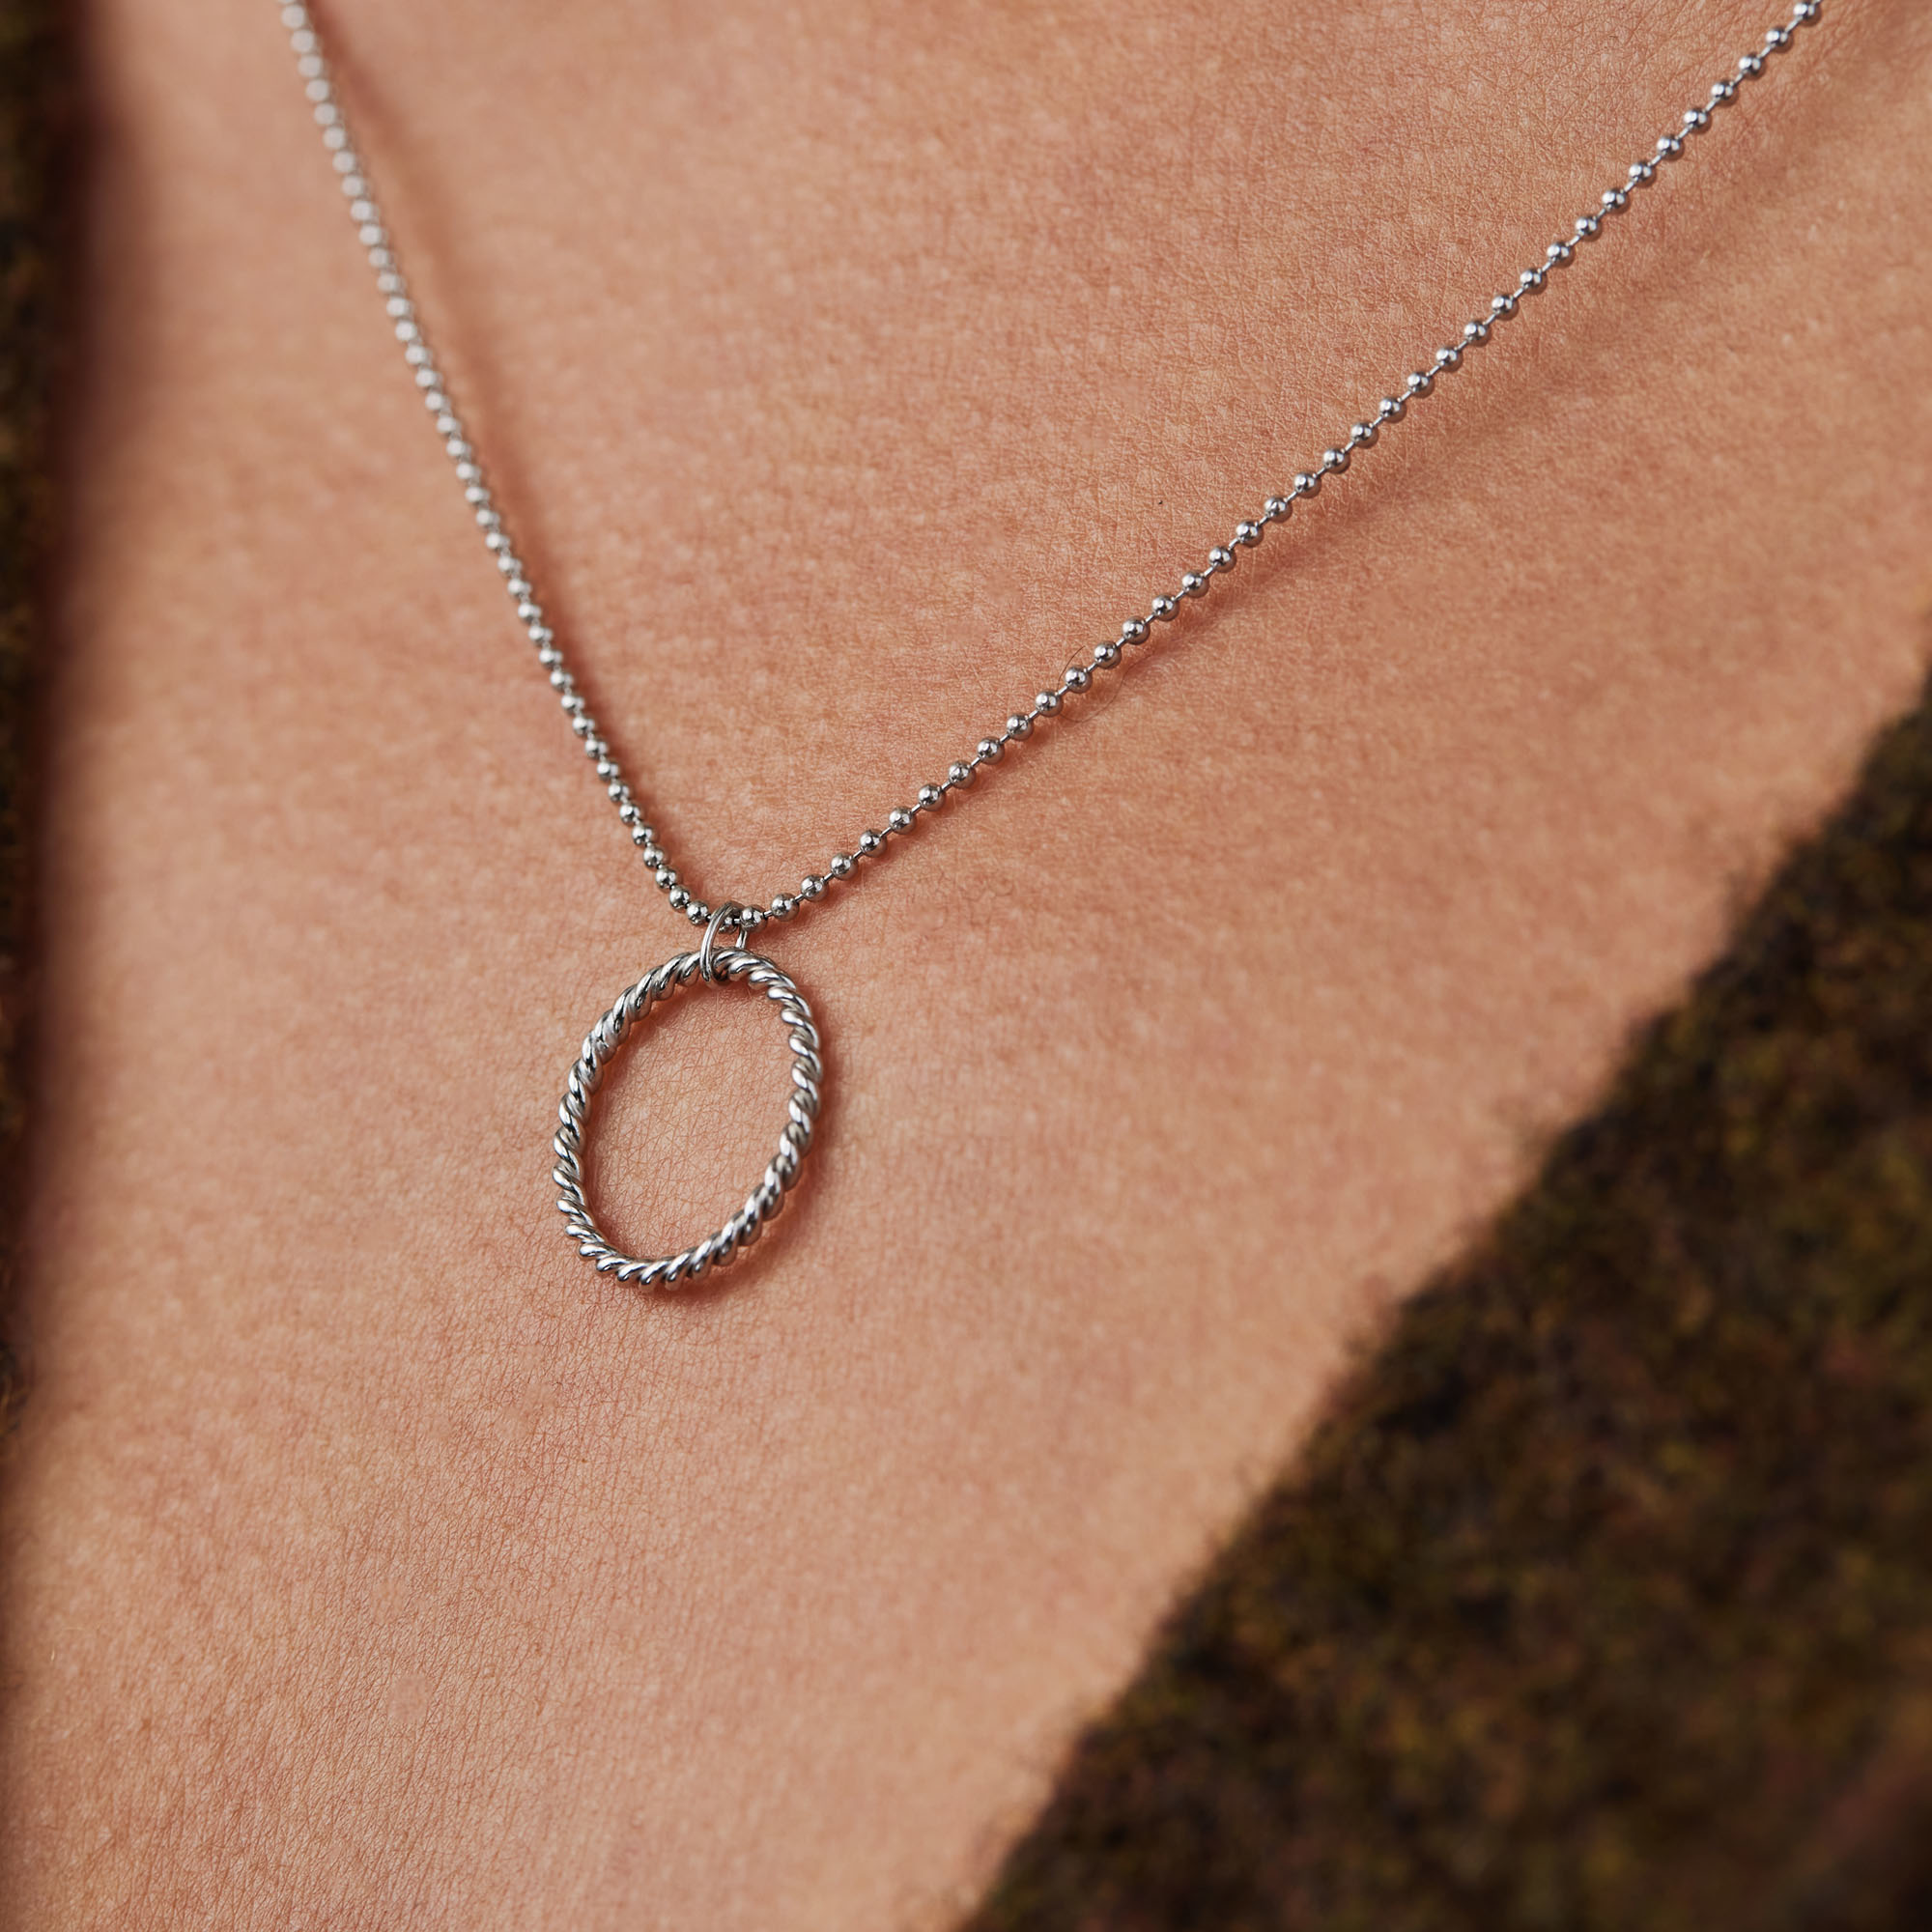 Violet Hamden Luna 925 sterling silver jewelry giftset